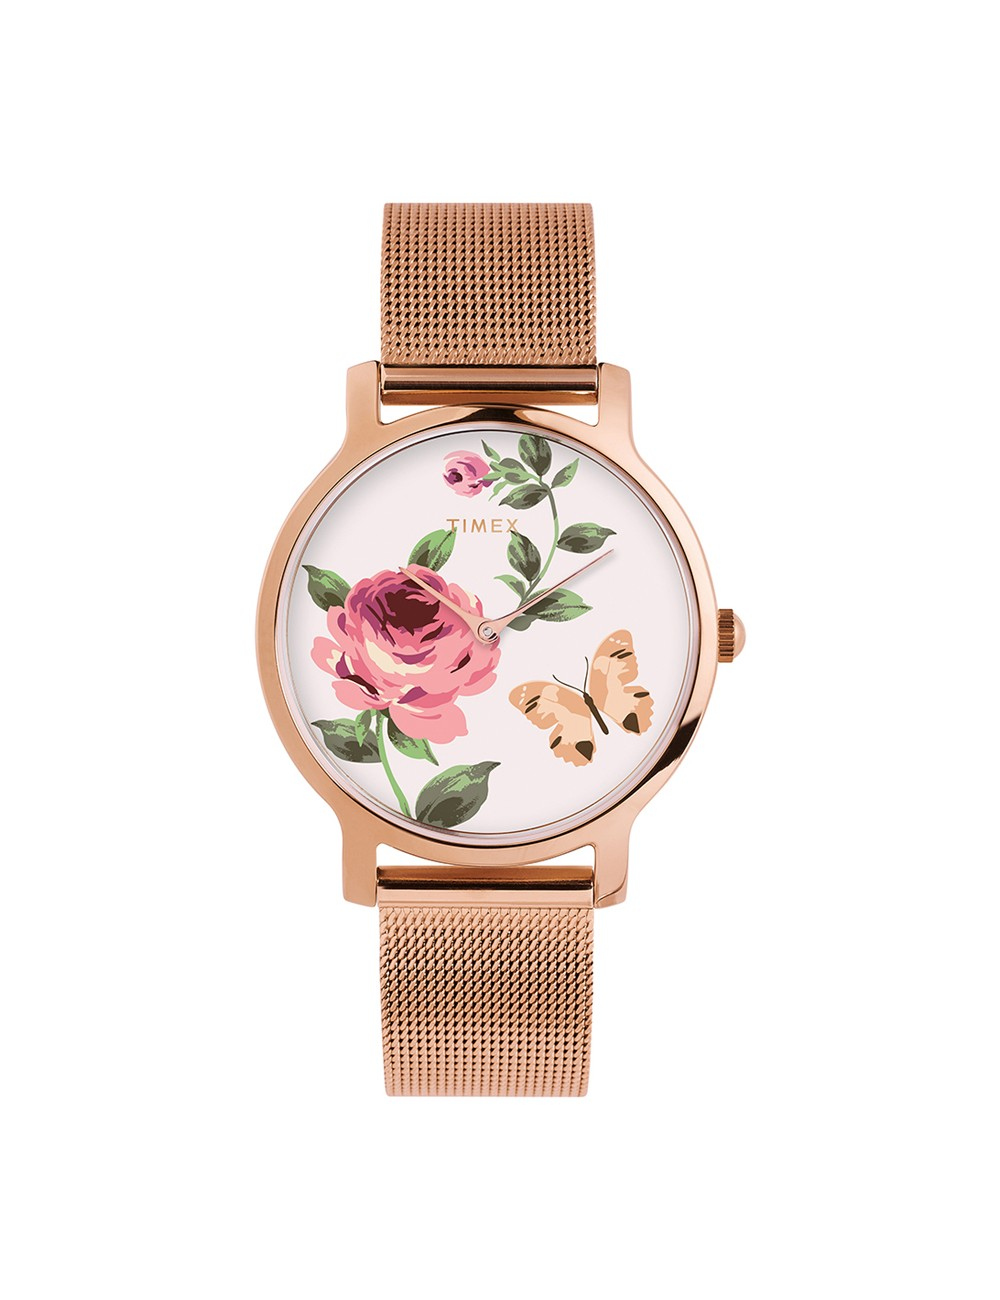 Timex Full Bloom TW2U19000 Ladies Watch